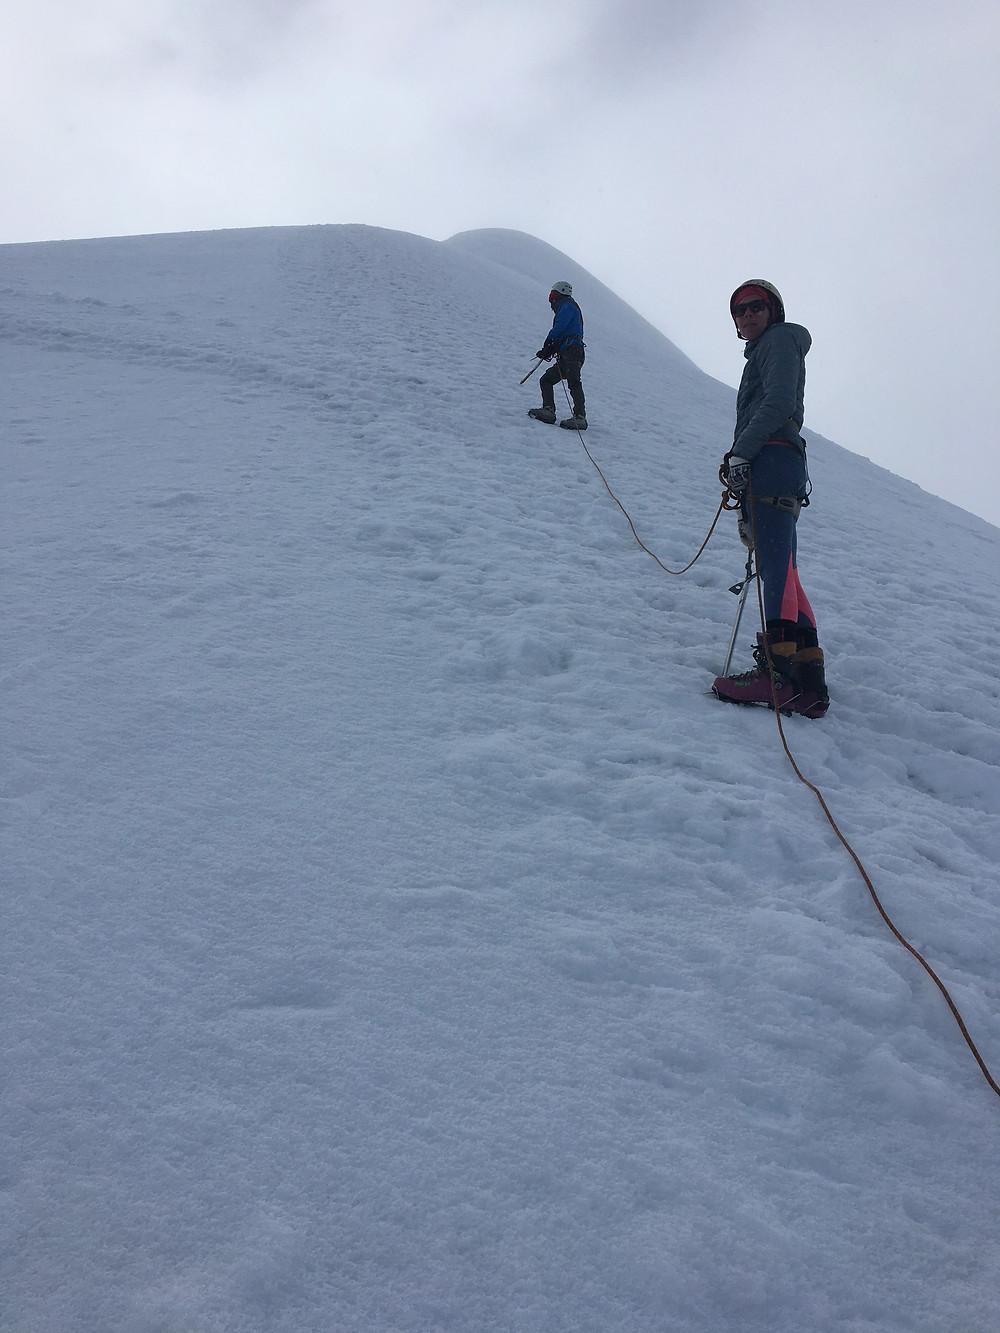 alpinisme au sommet mateo